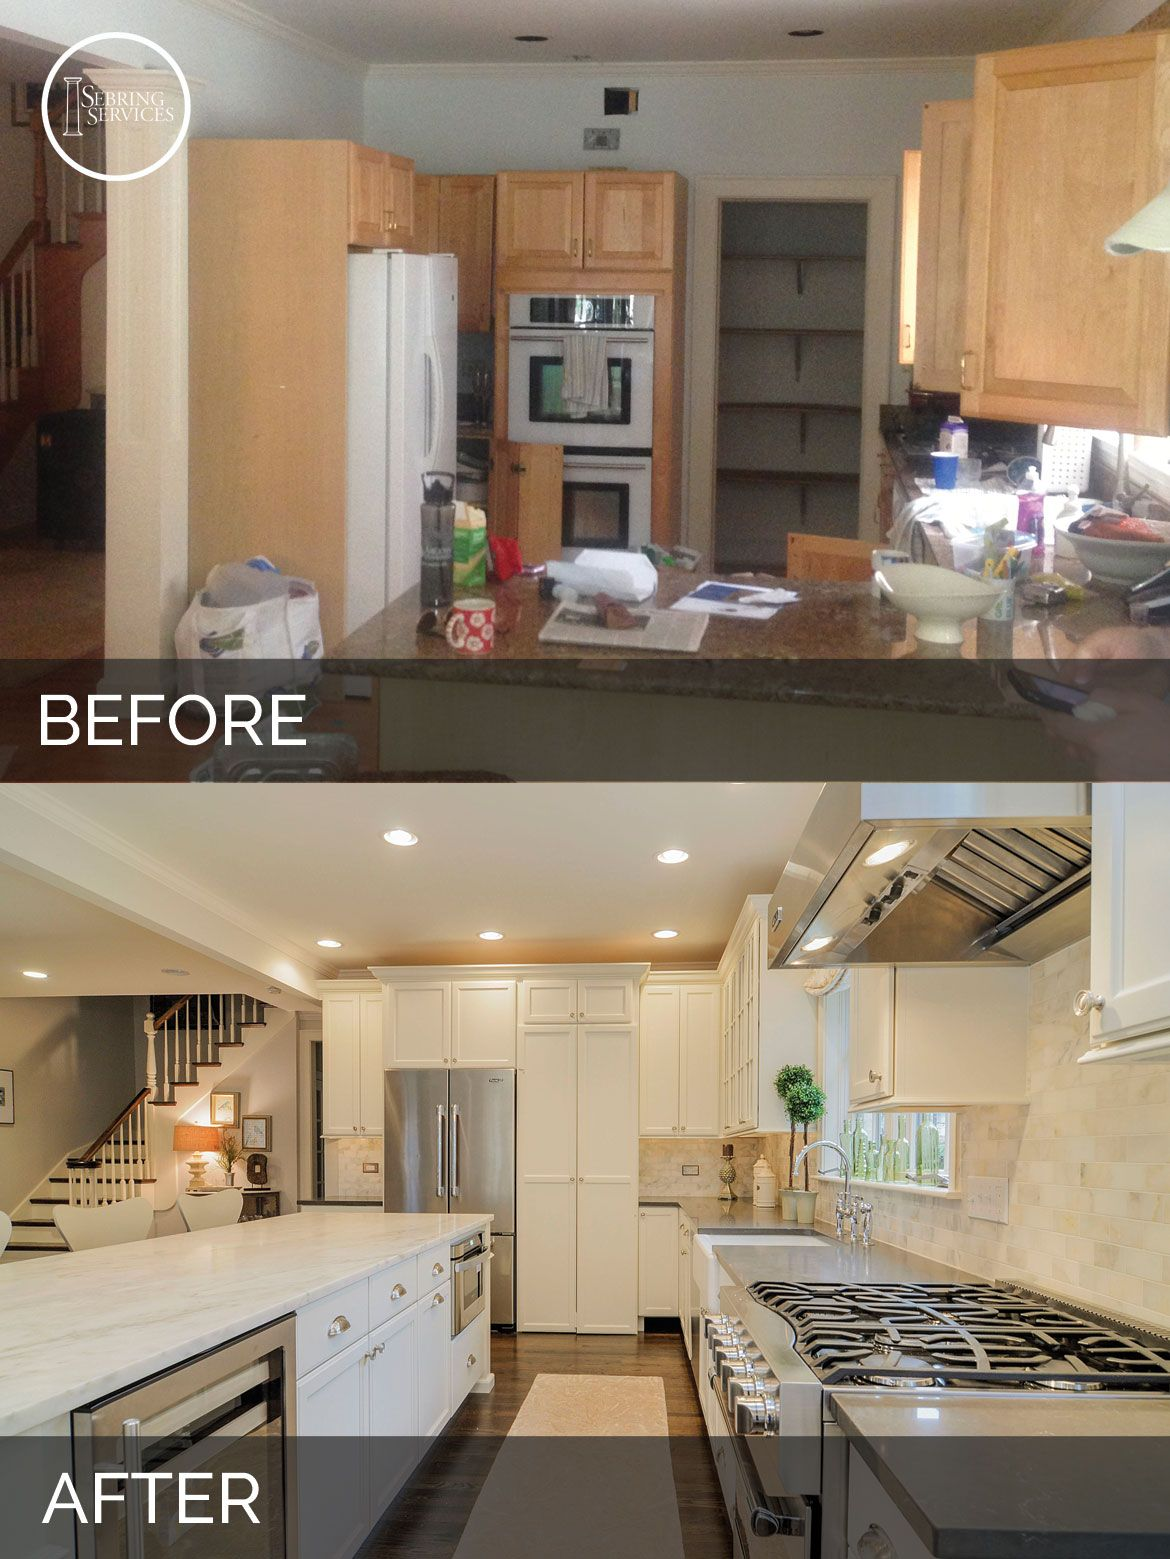 Ben ellens kitchen before after pictures kitchen